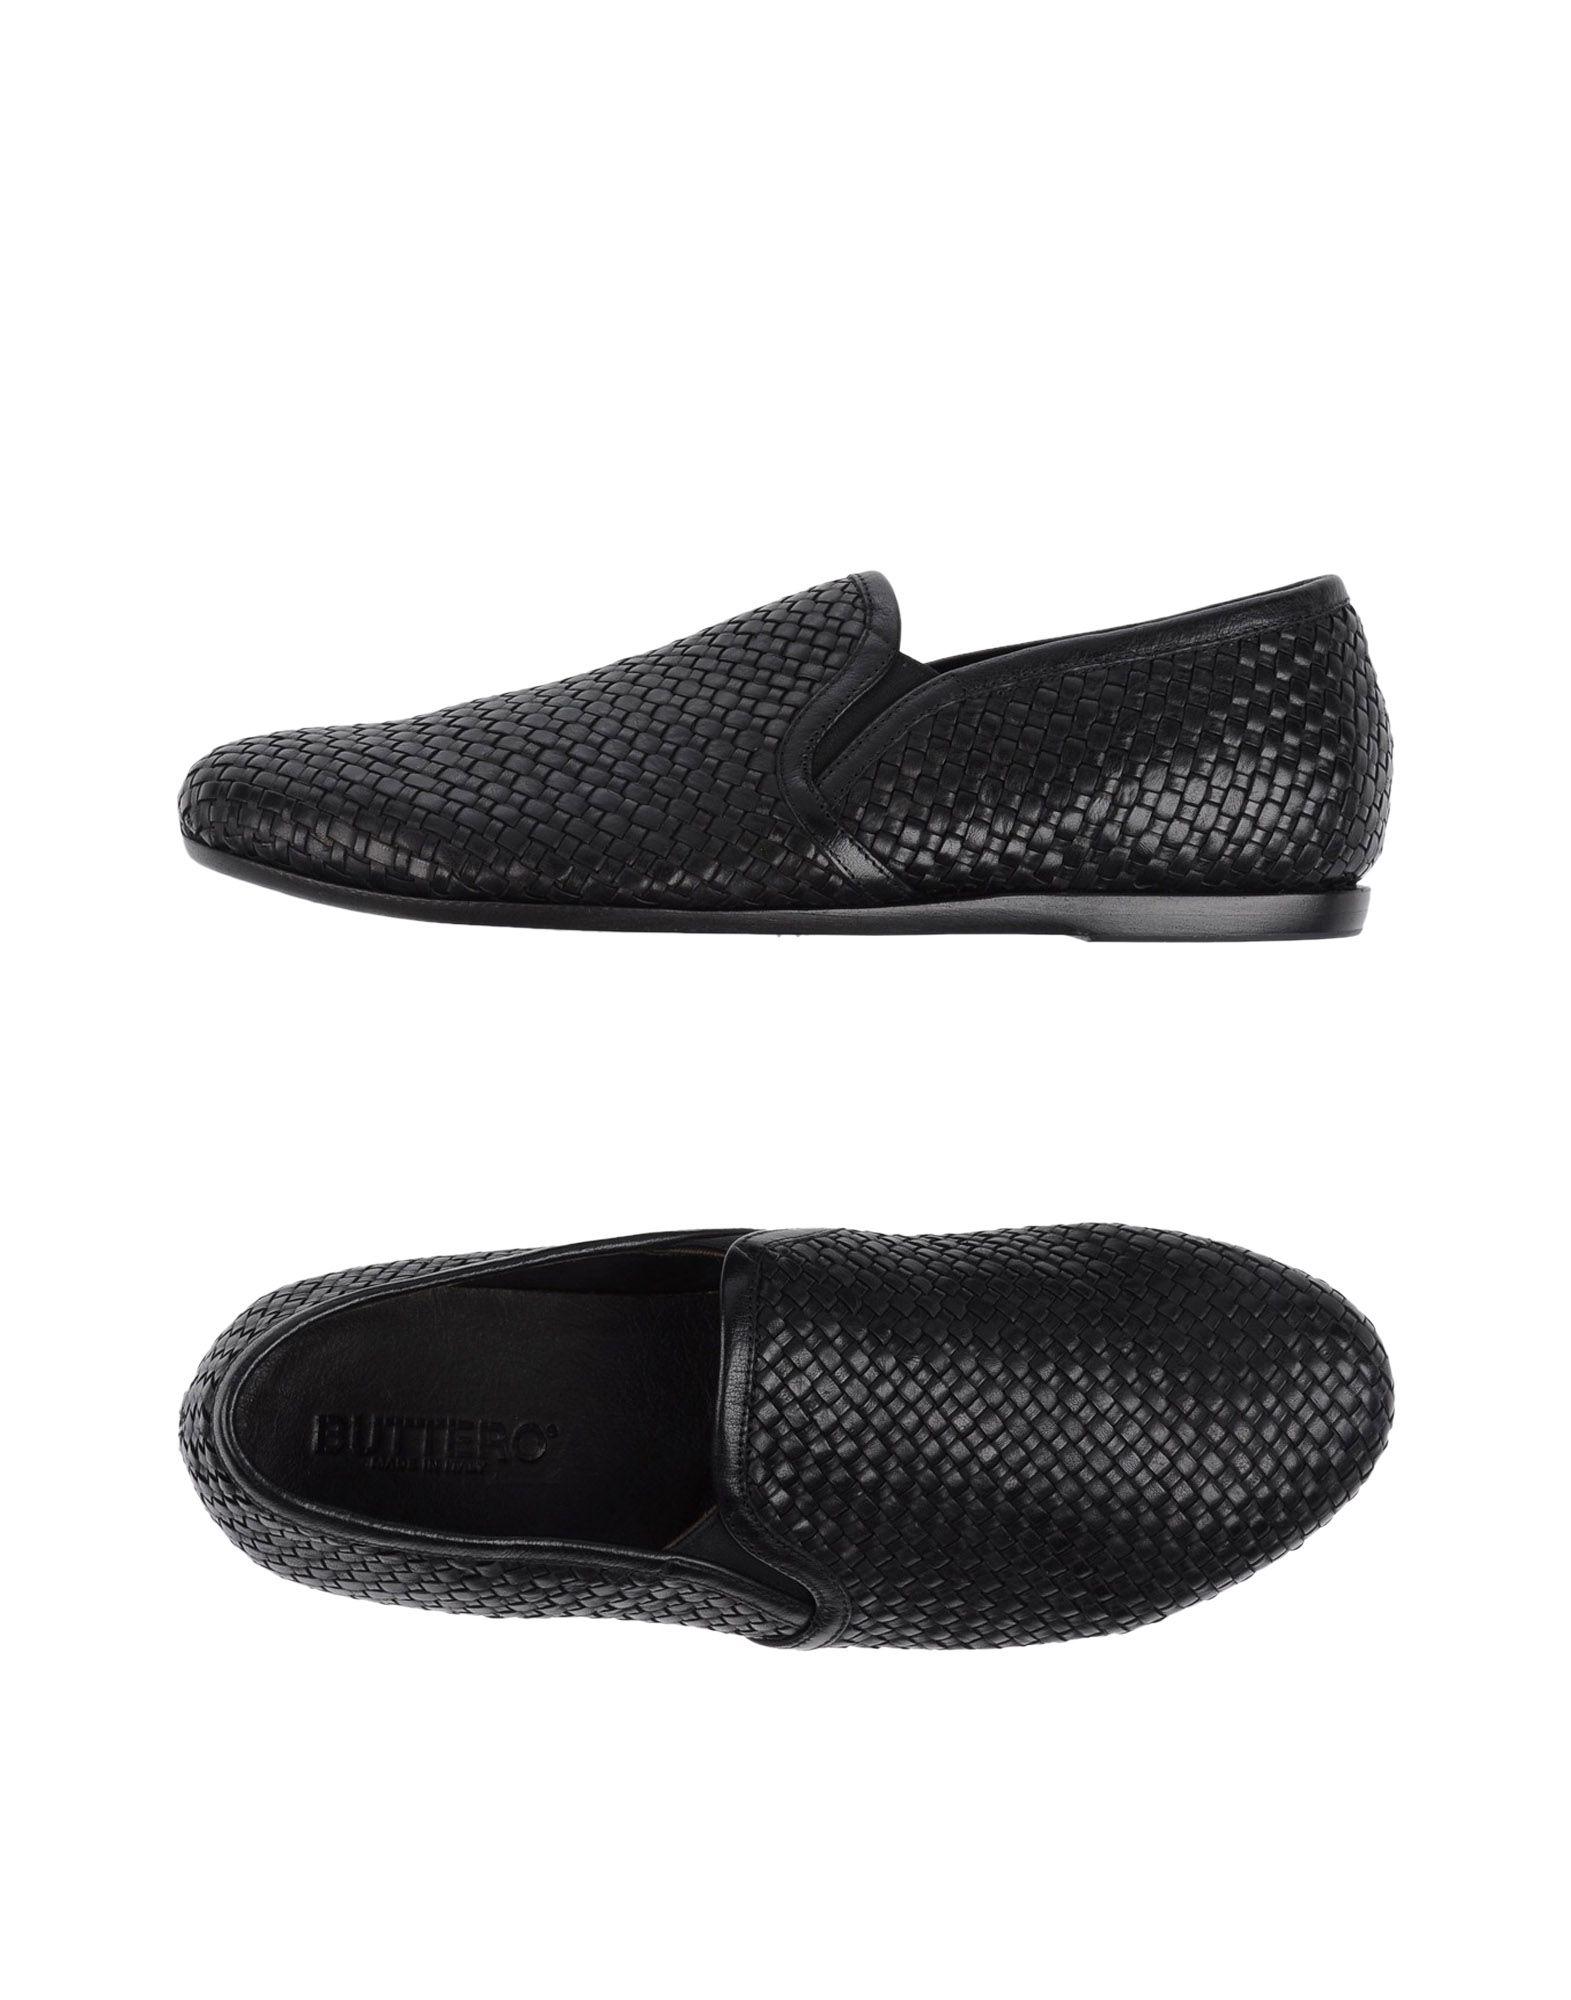 Buttero® Mokassins Herren Qualität  11194851HH Gute Qualität Herren beliebte Schuhe 57a17c